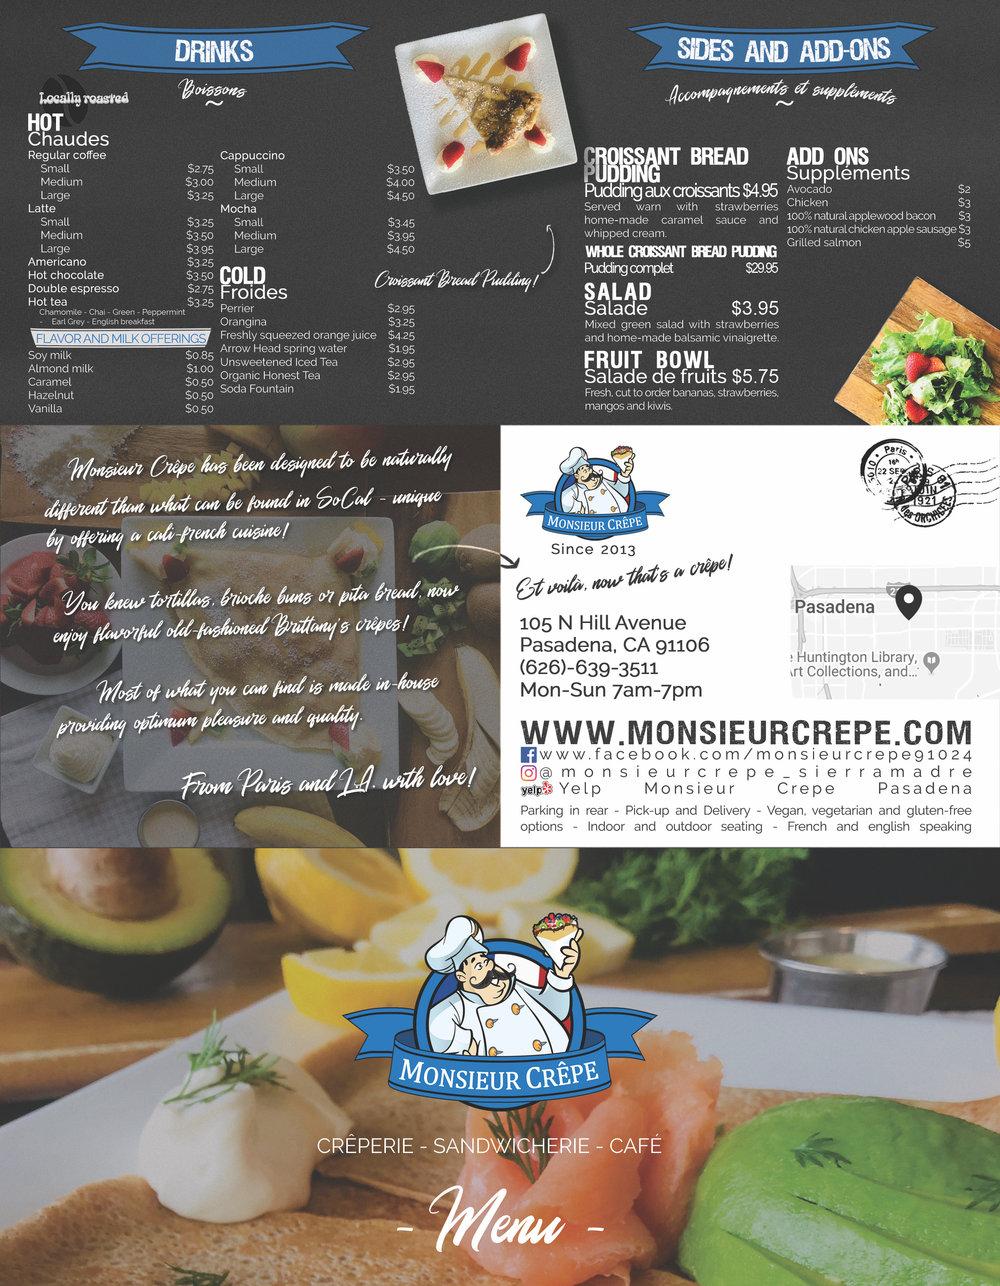 MENU_Monsieur_Crepe_Quality_Food_French_Crperie_LosAngeles_Pasadena_-FRONT-TAKEOUT-MENU.jpg